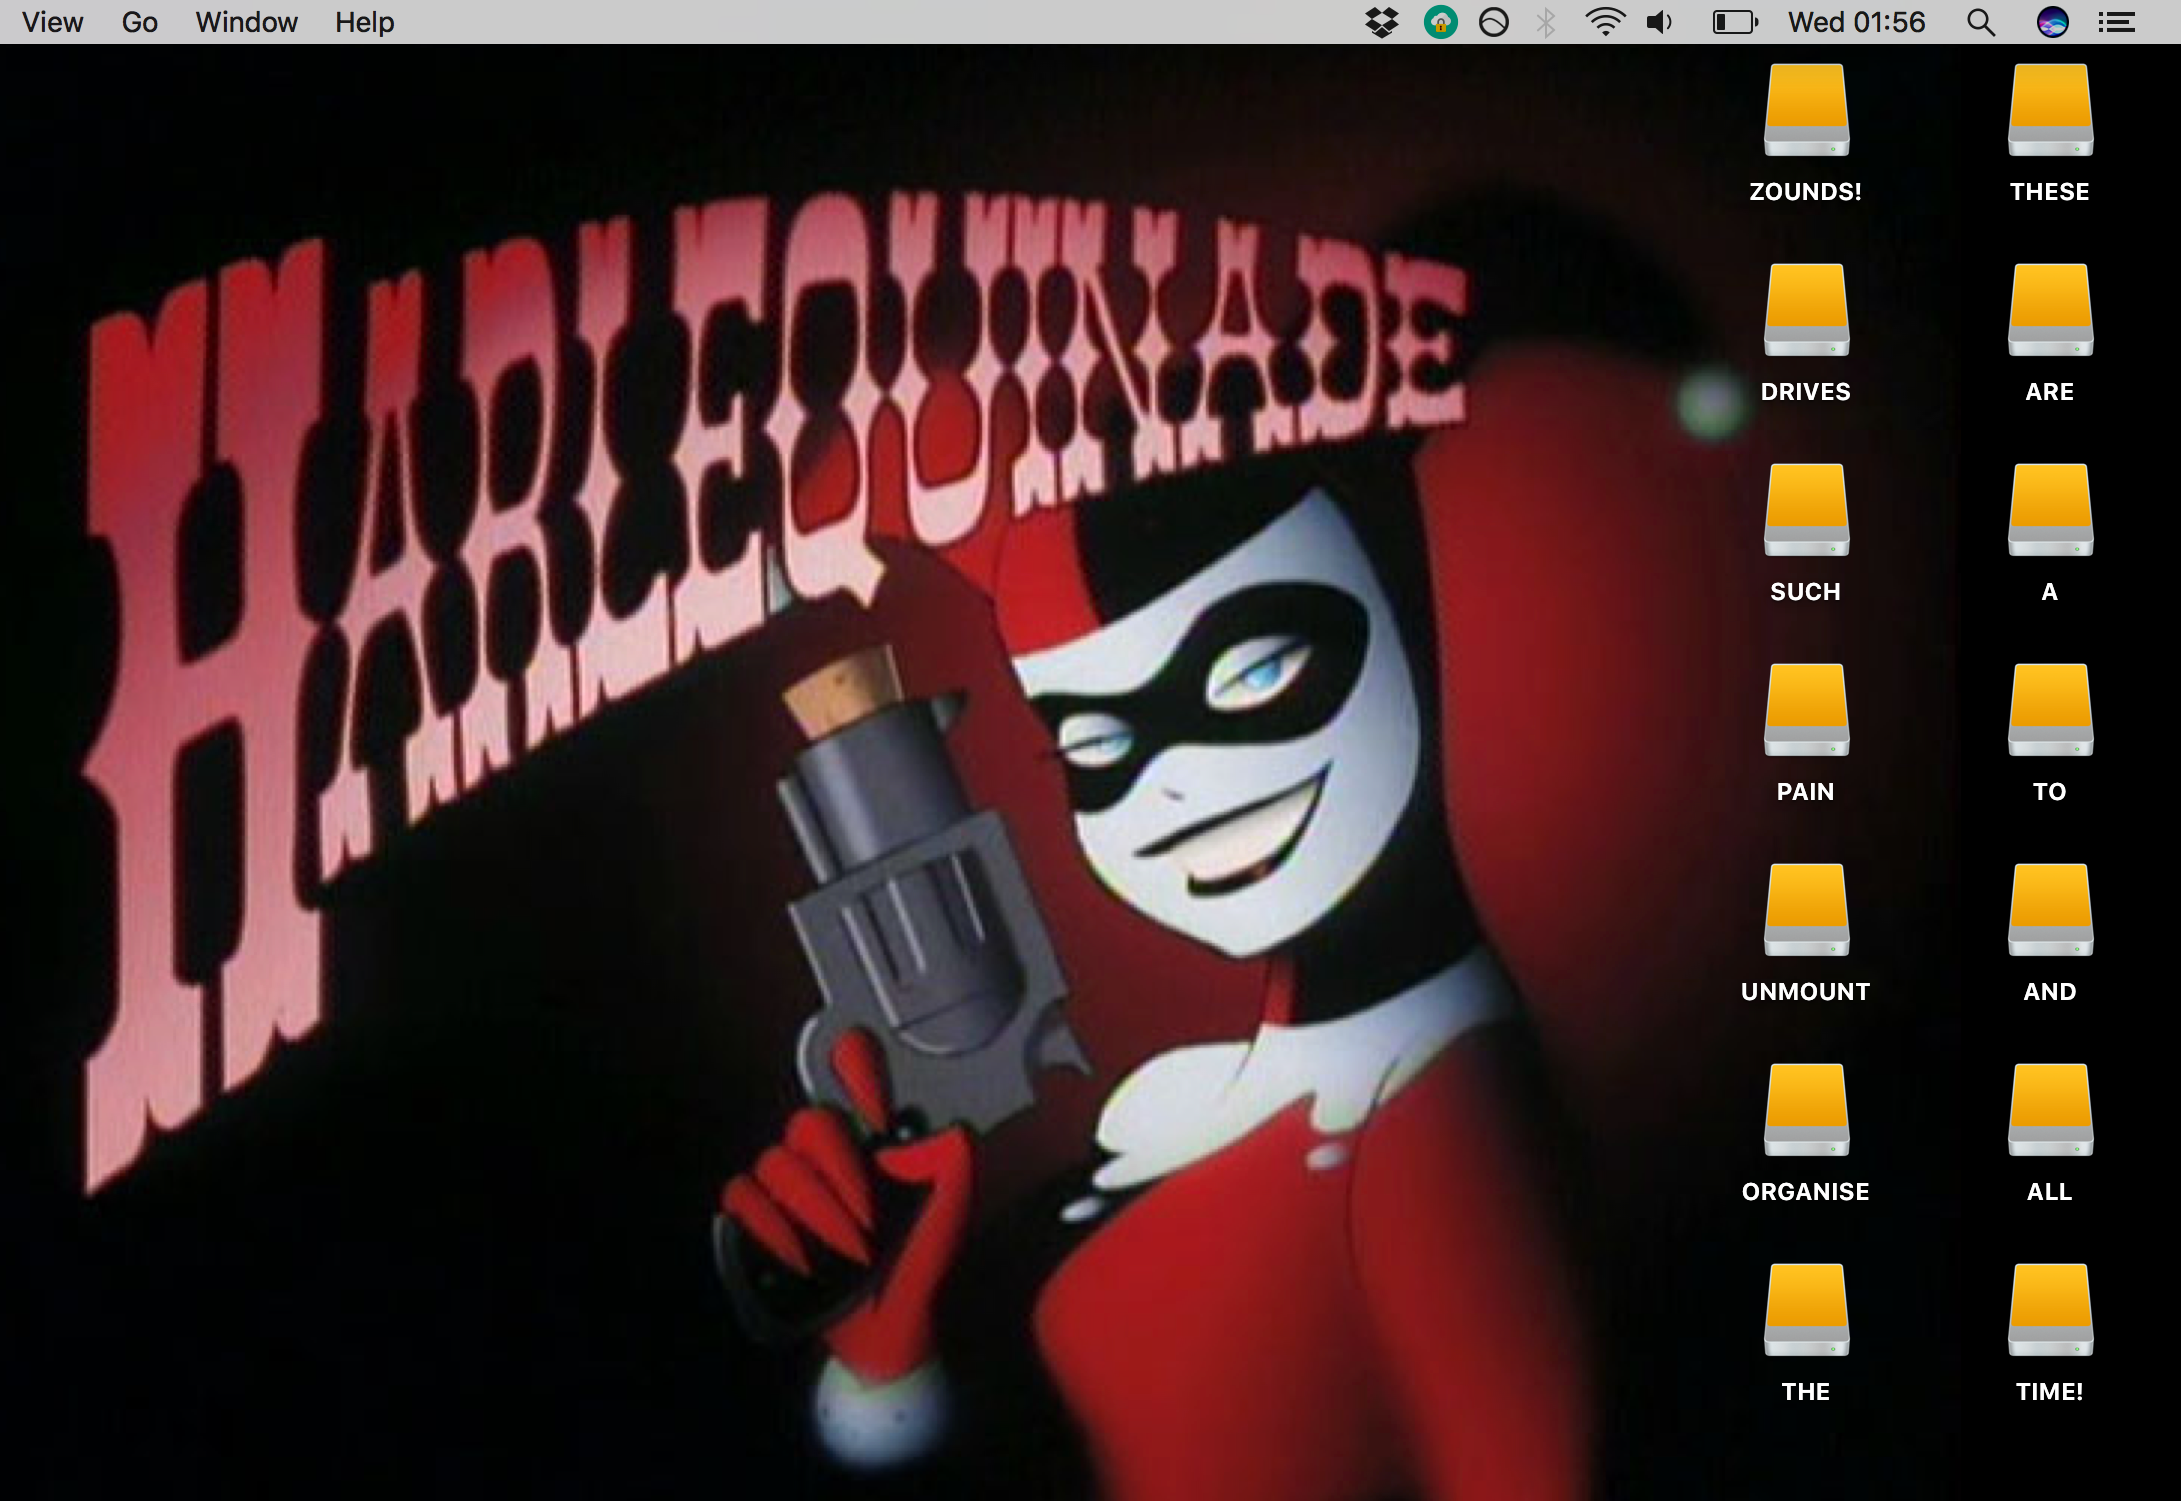 desktop drive icons